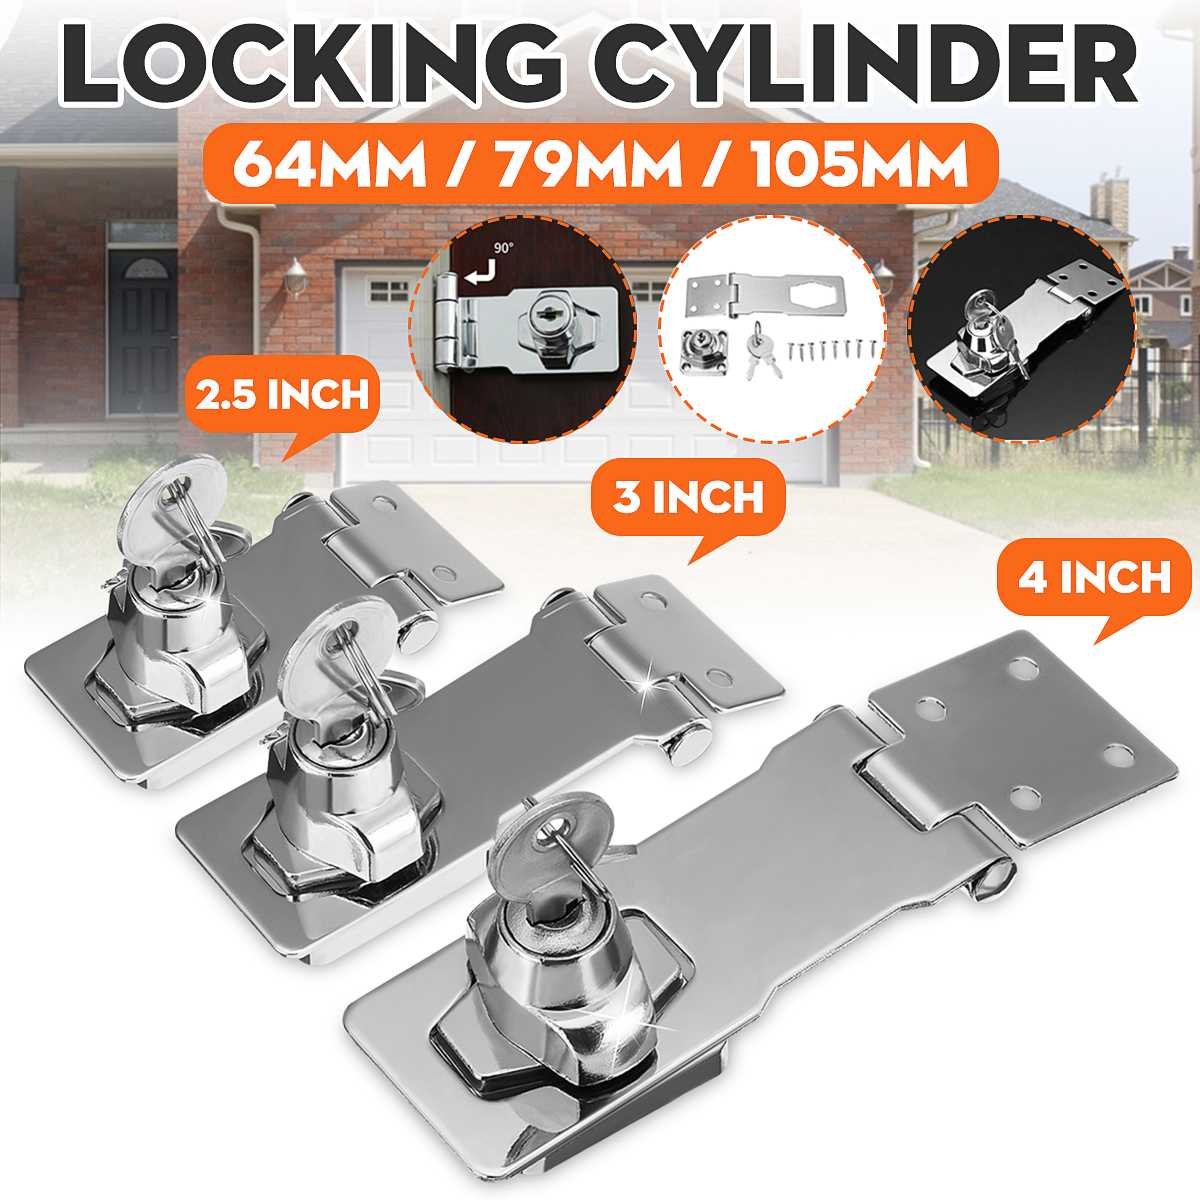 2.5/3/4 Inch Zinc Alloy Garage Shed Gate Door Hasp Lock Staple Security Key Locking Burglar-proof Hardware